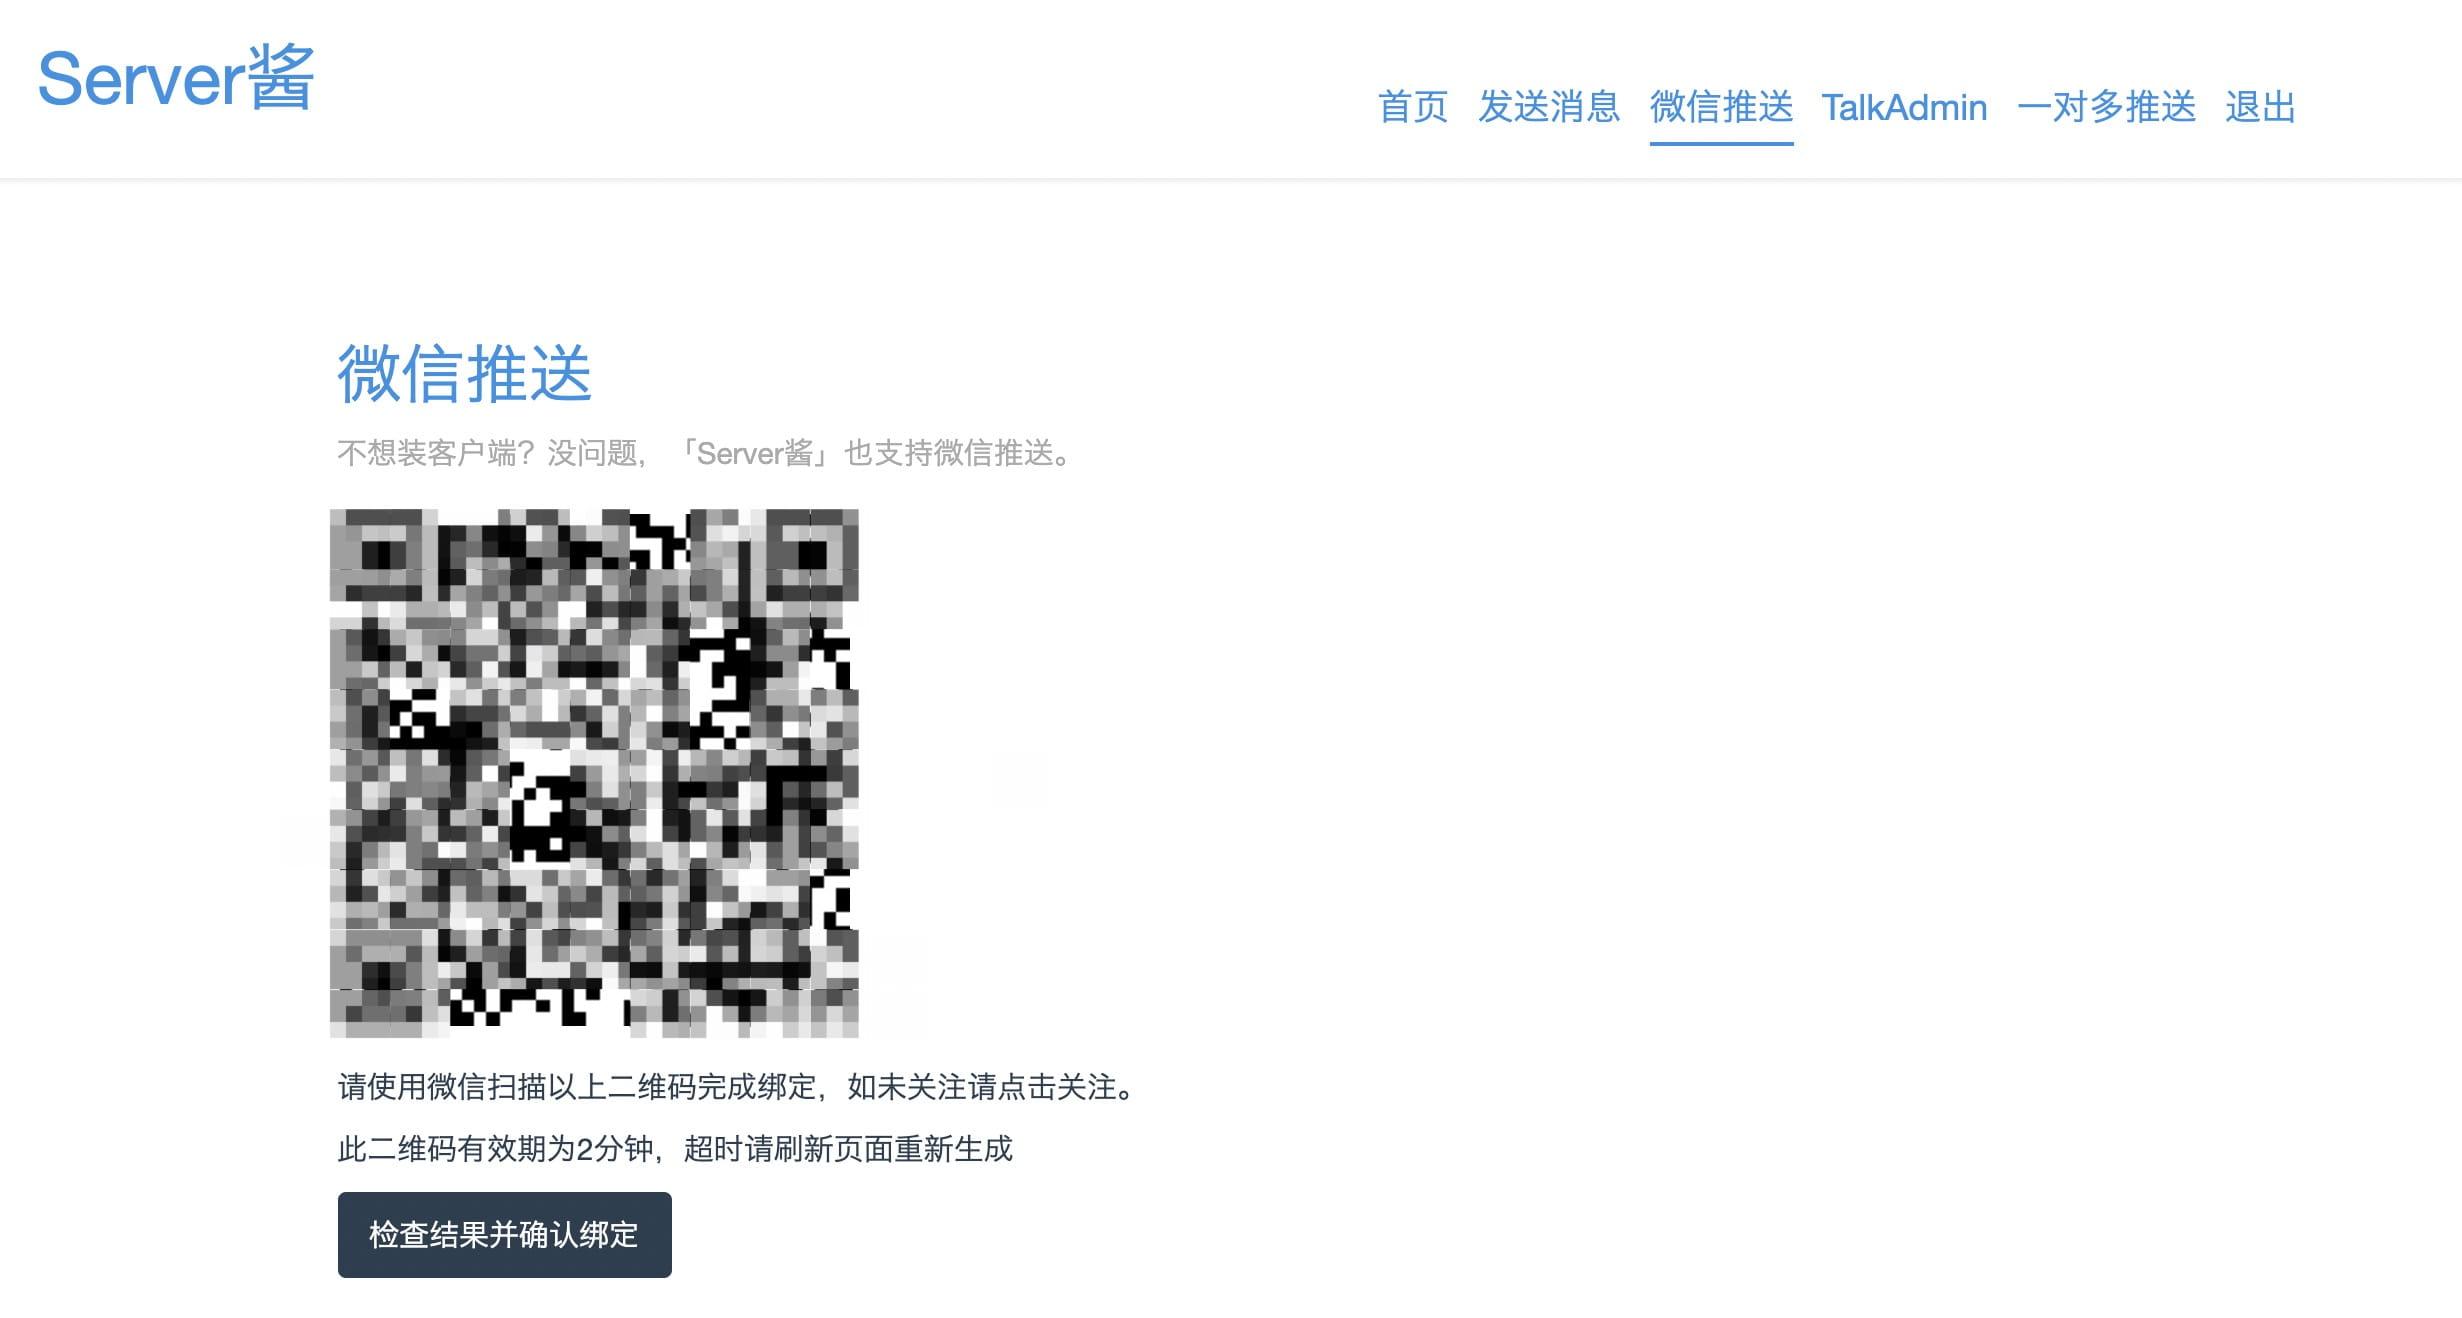 2020_11_13_server_jiang_qrcode